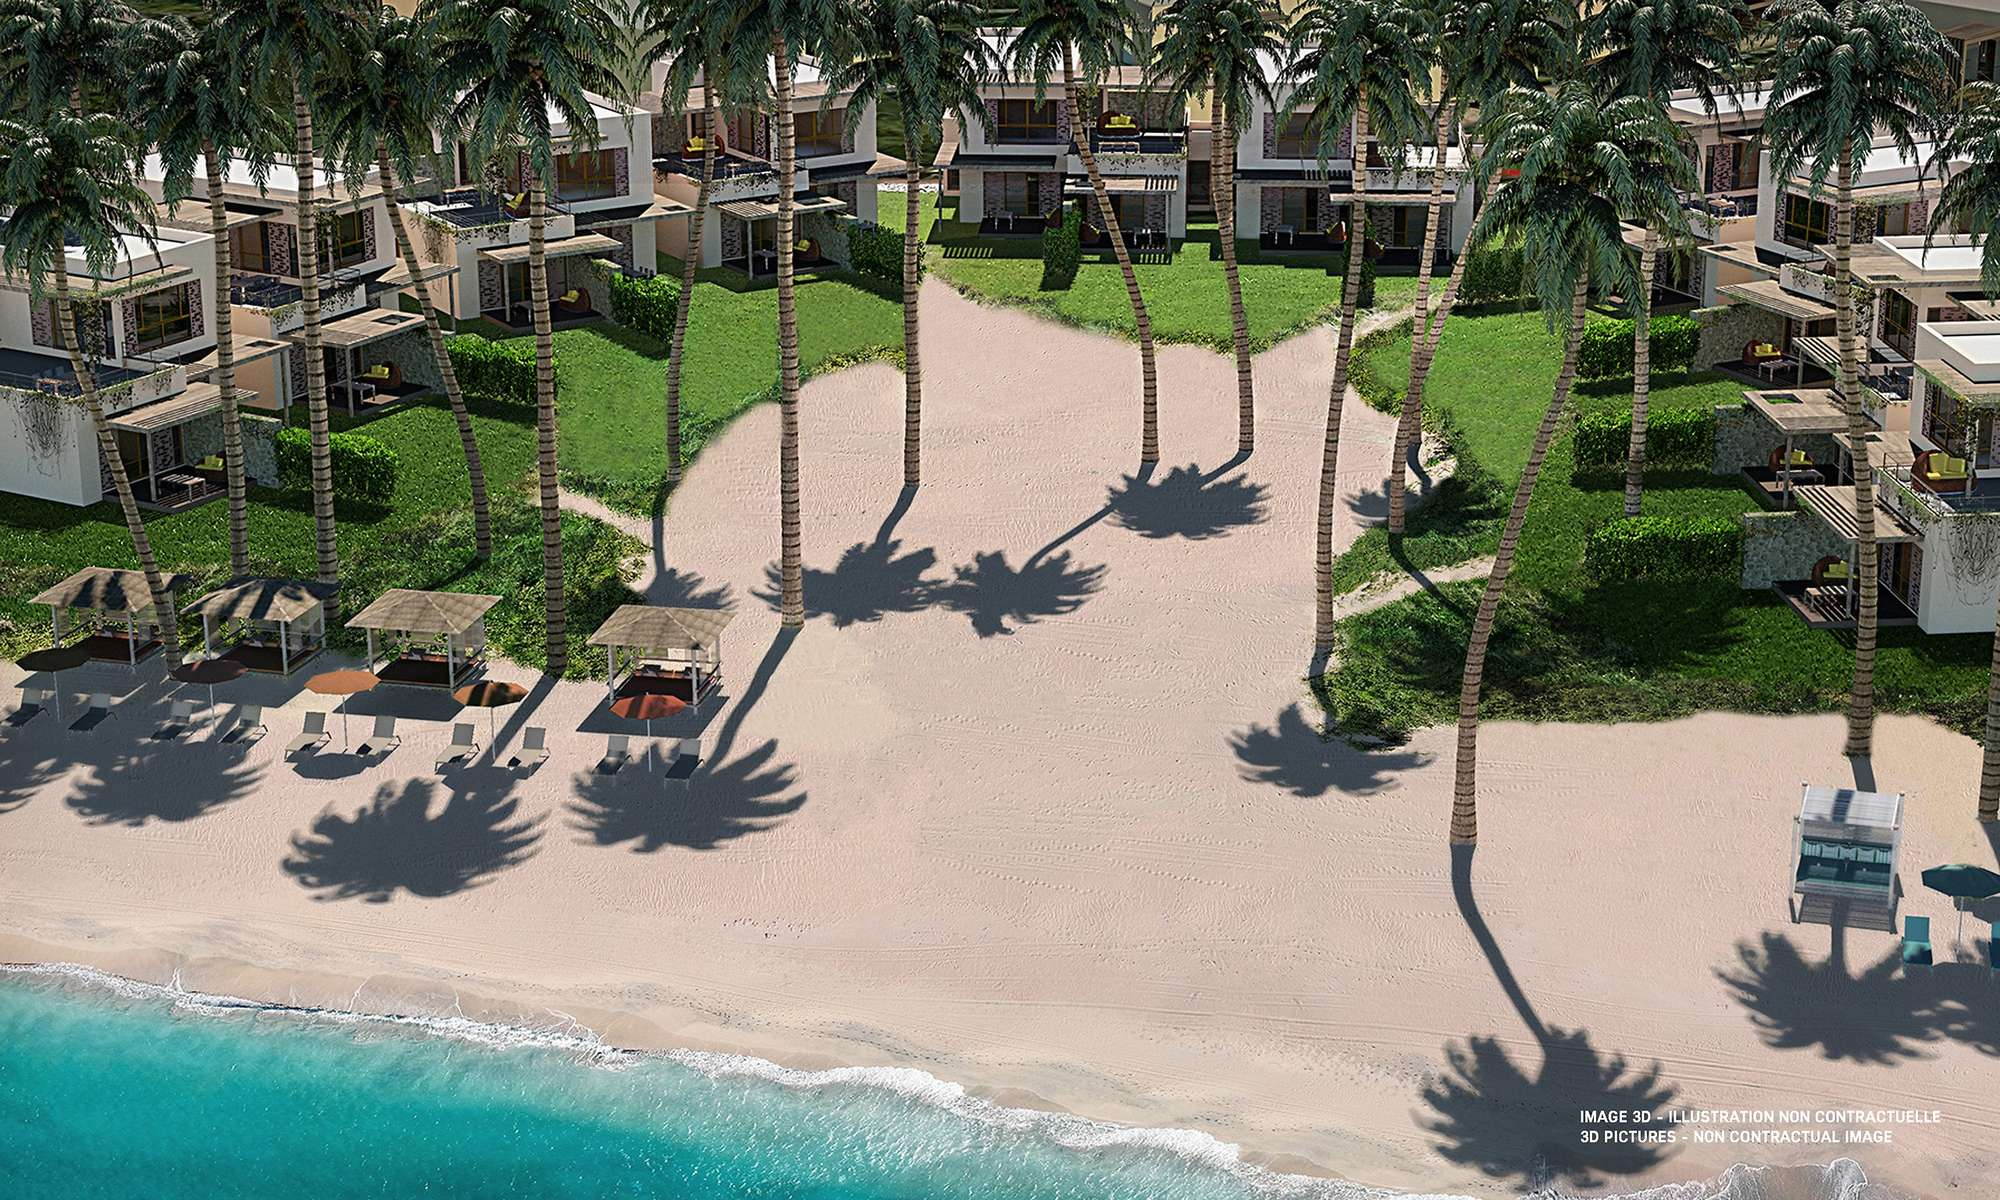 https___ns.clubmed.com_dream_EXCLUSIVE_COLLECTION_Resorts_Miches_Playa_Esmeralda_195443-cc1o95v2aj-swhr